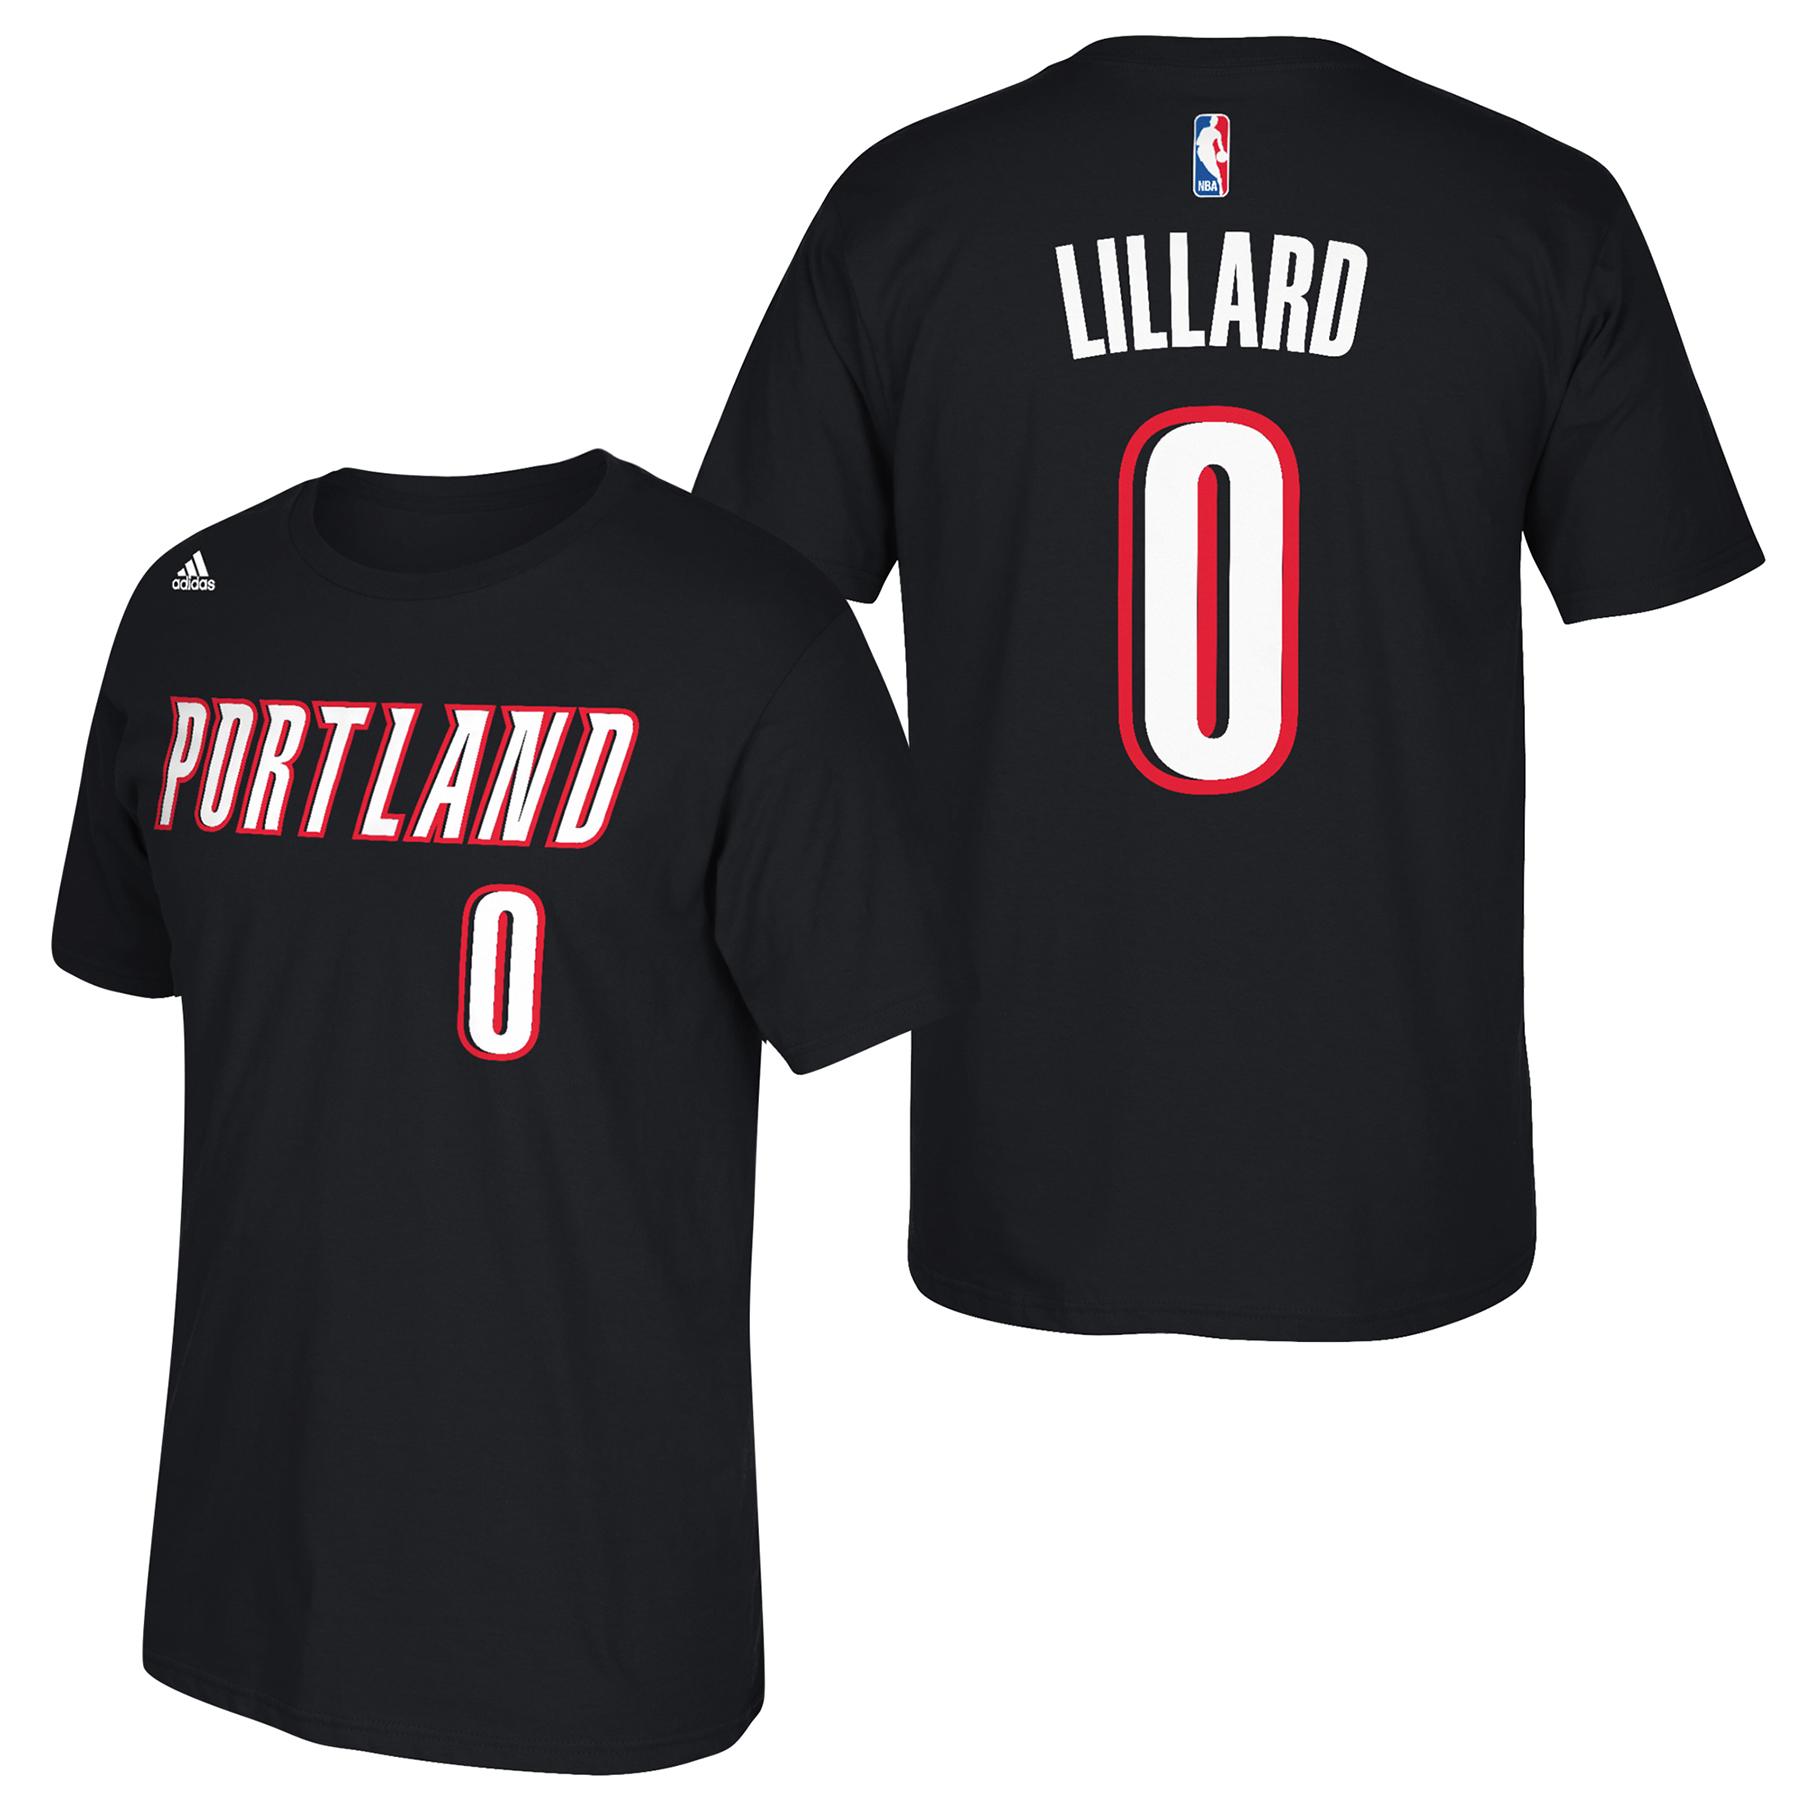 Portland Trail Blazers adidas Name & Number T-Shirt - Damian Lillard